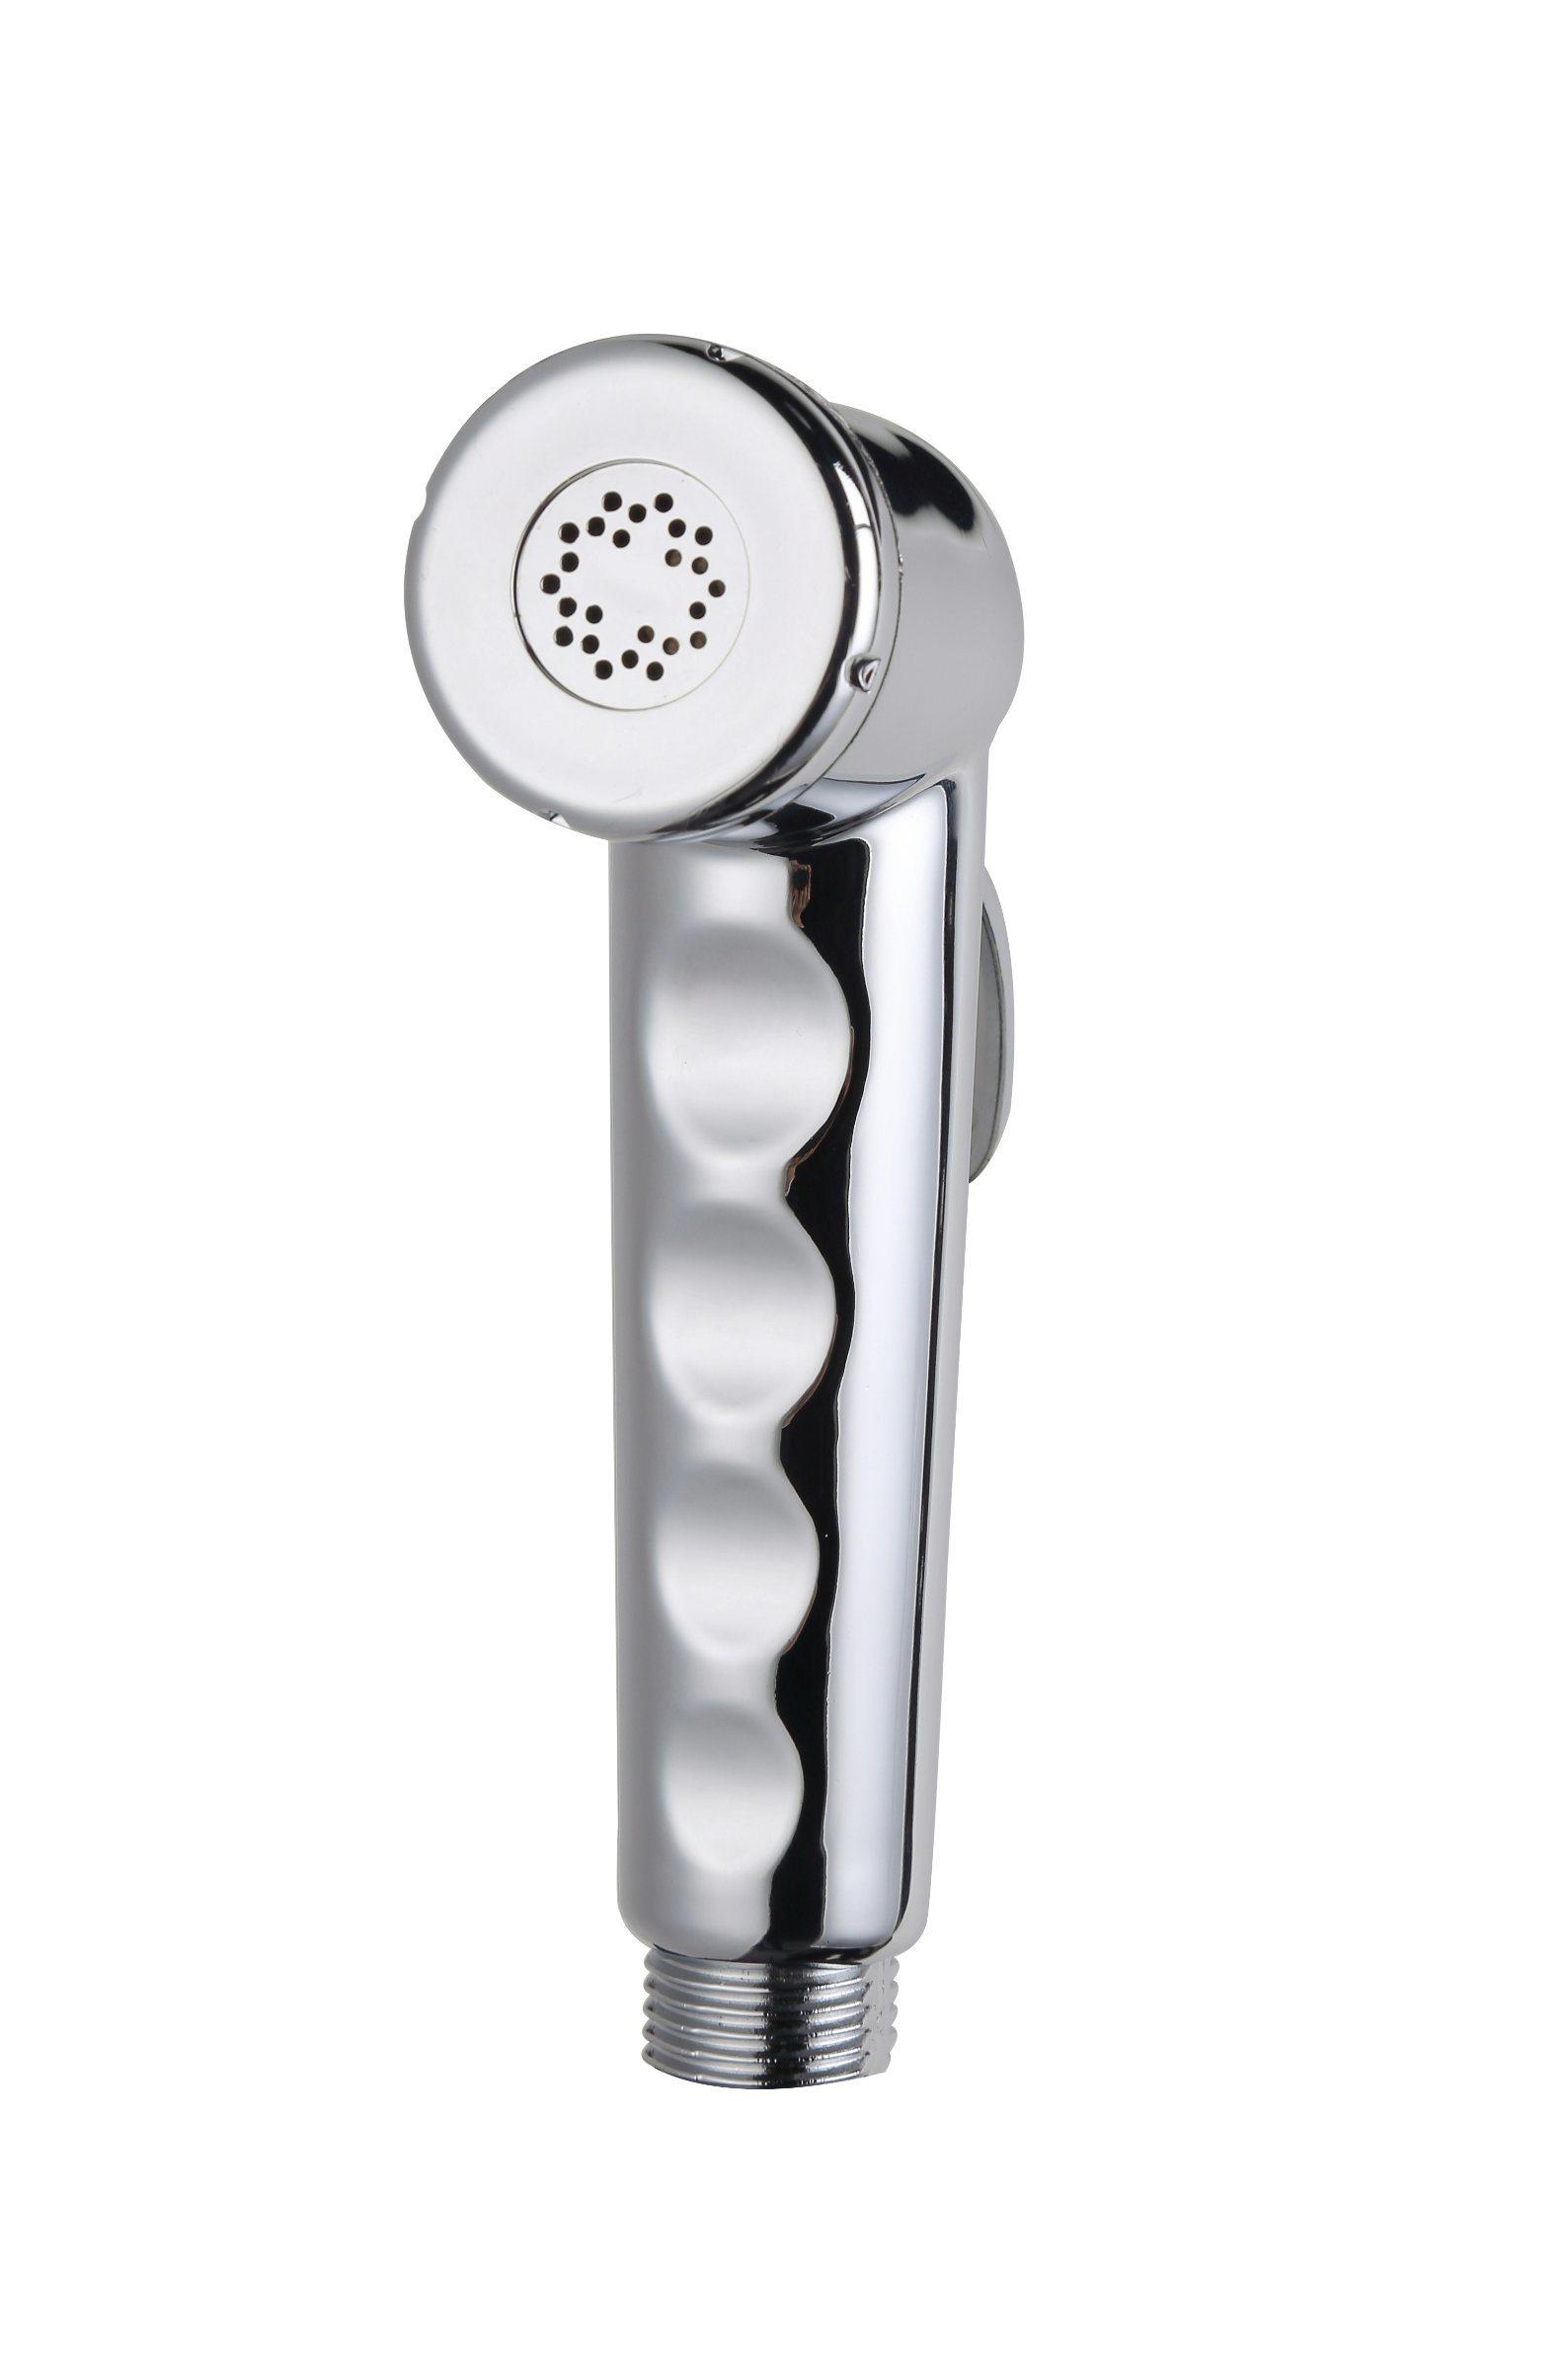 China Small Bathroom High Quality Cheap and Portable Bidet 3071 ...